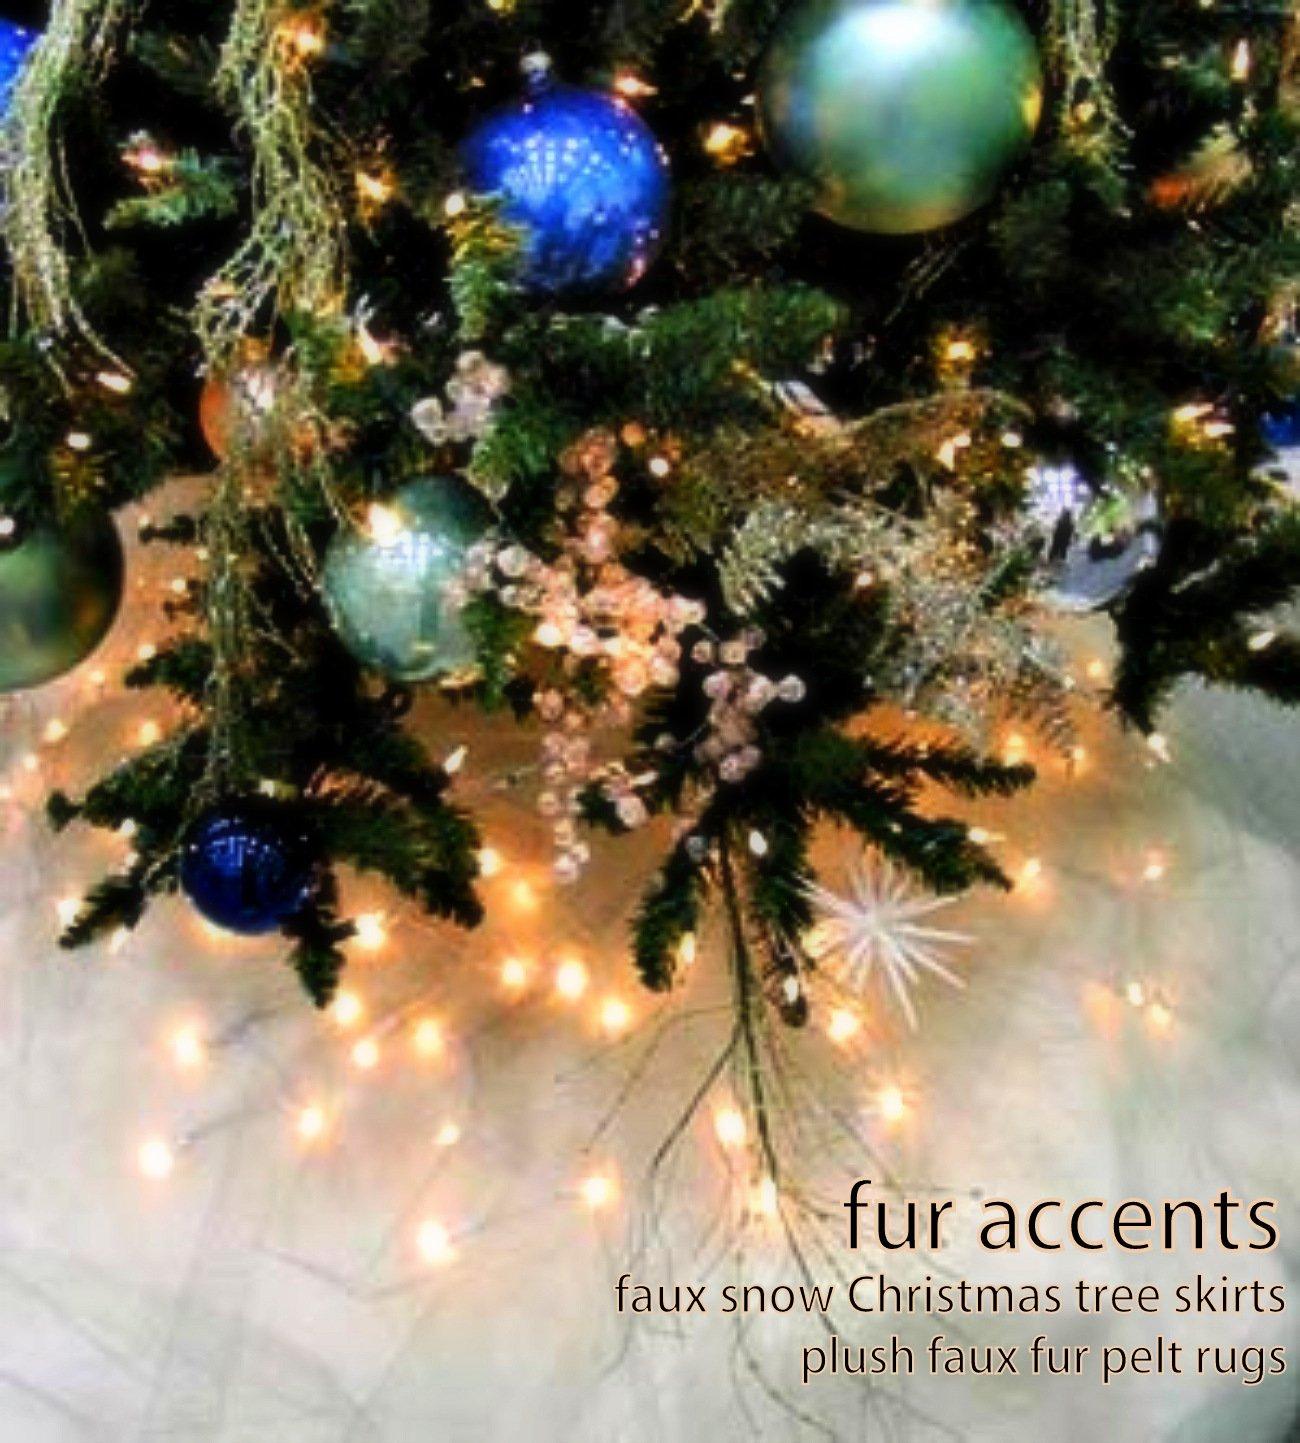 Fur Accents Christmas Holiday Tree Skirt, Plush Shaggy Faux Fur (Snow White, 36'' Diameter)